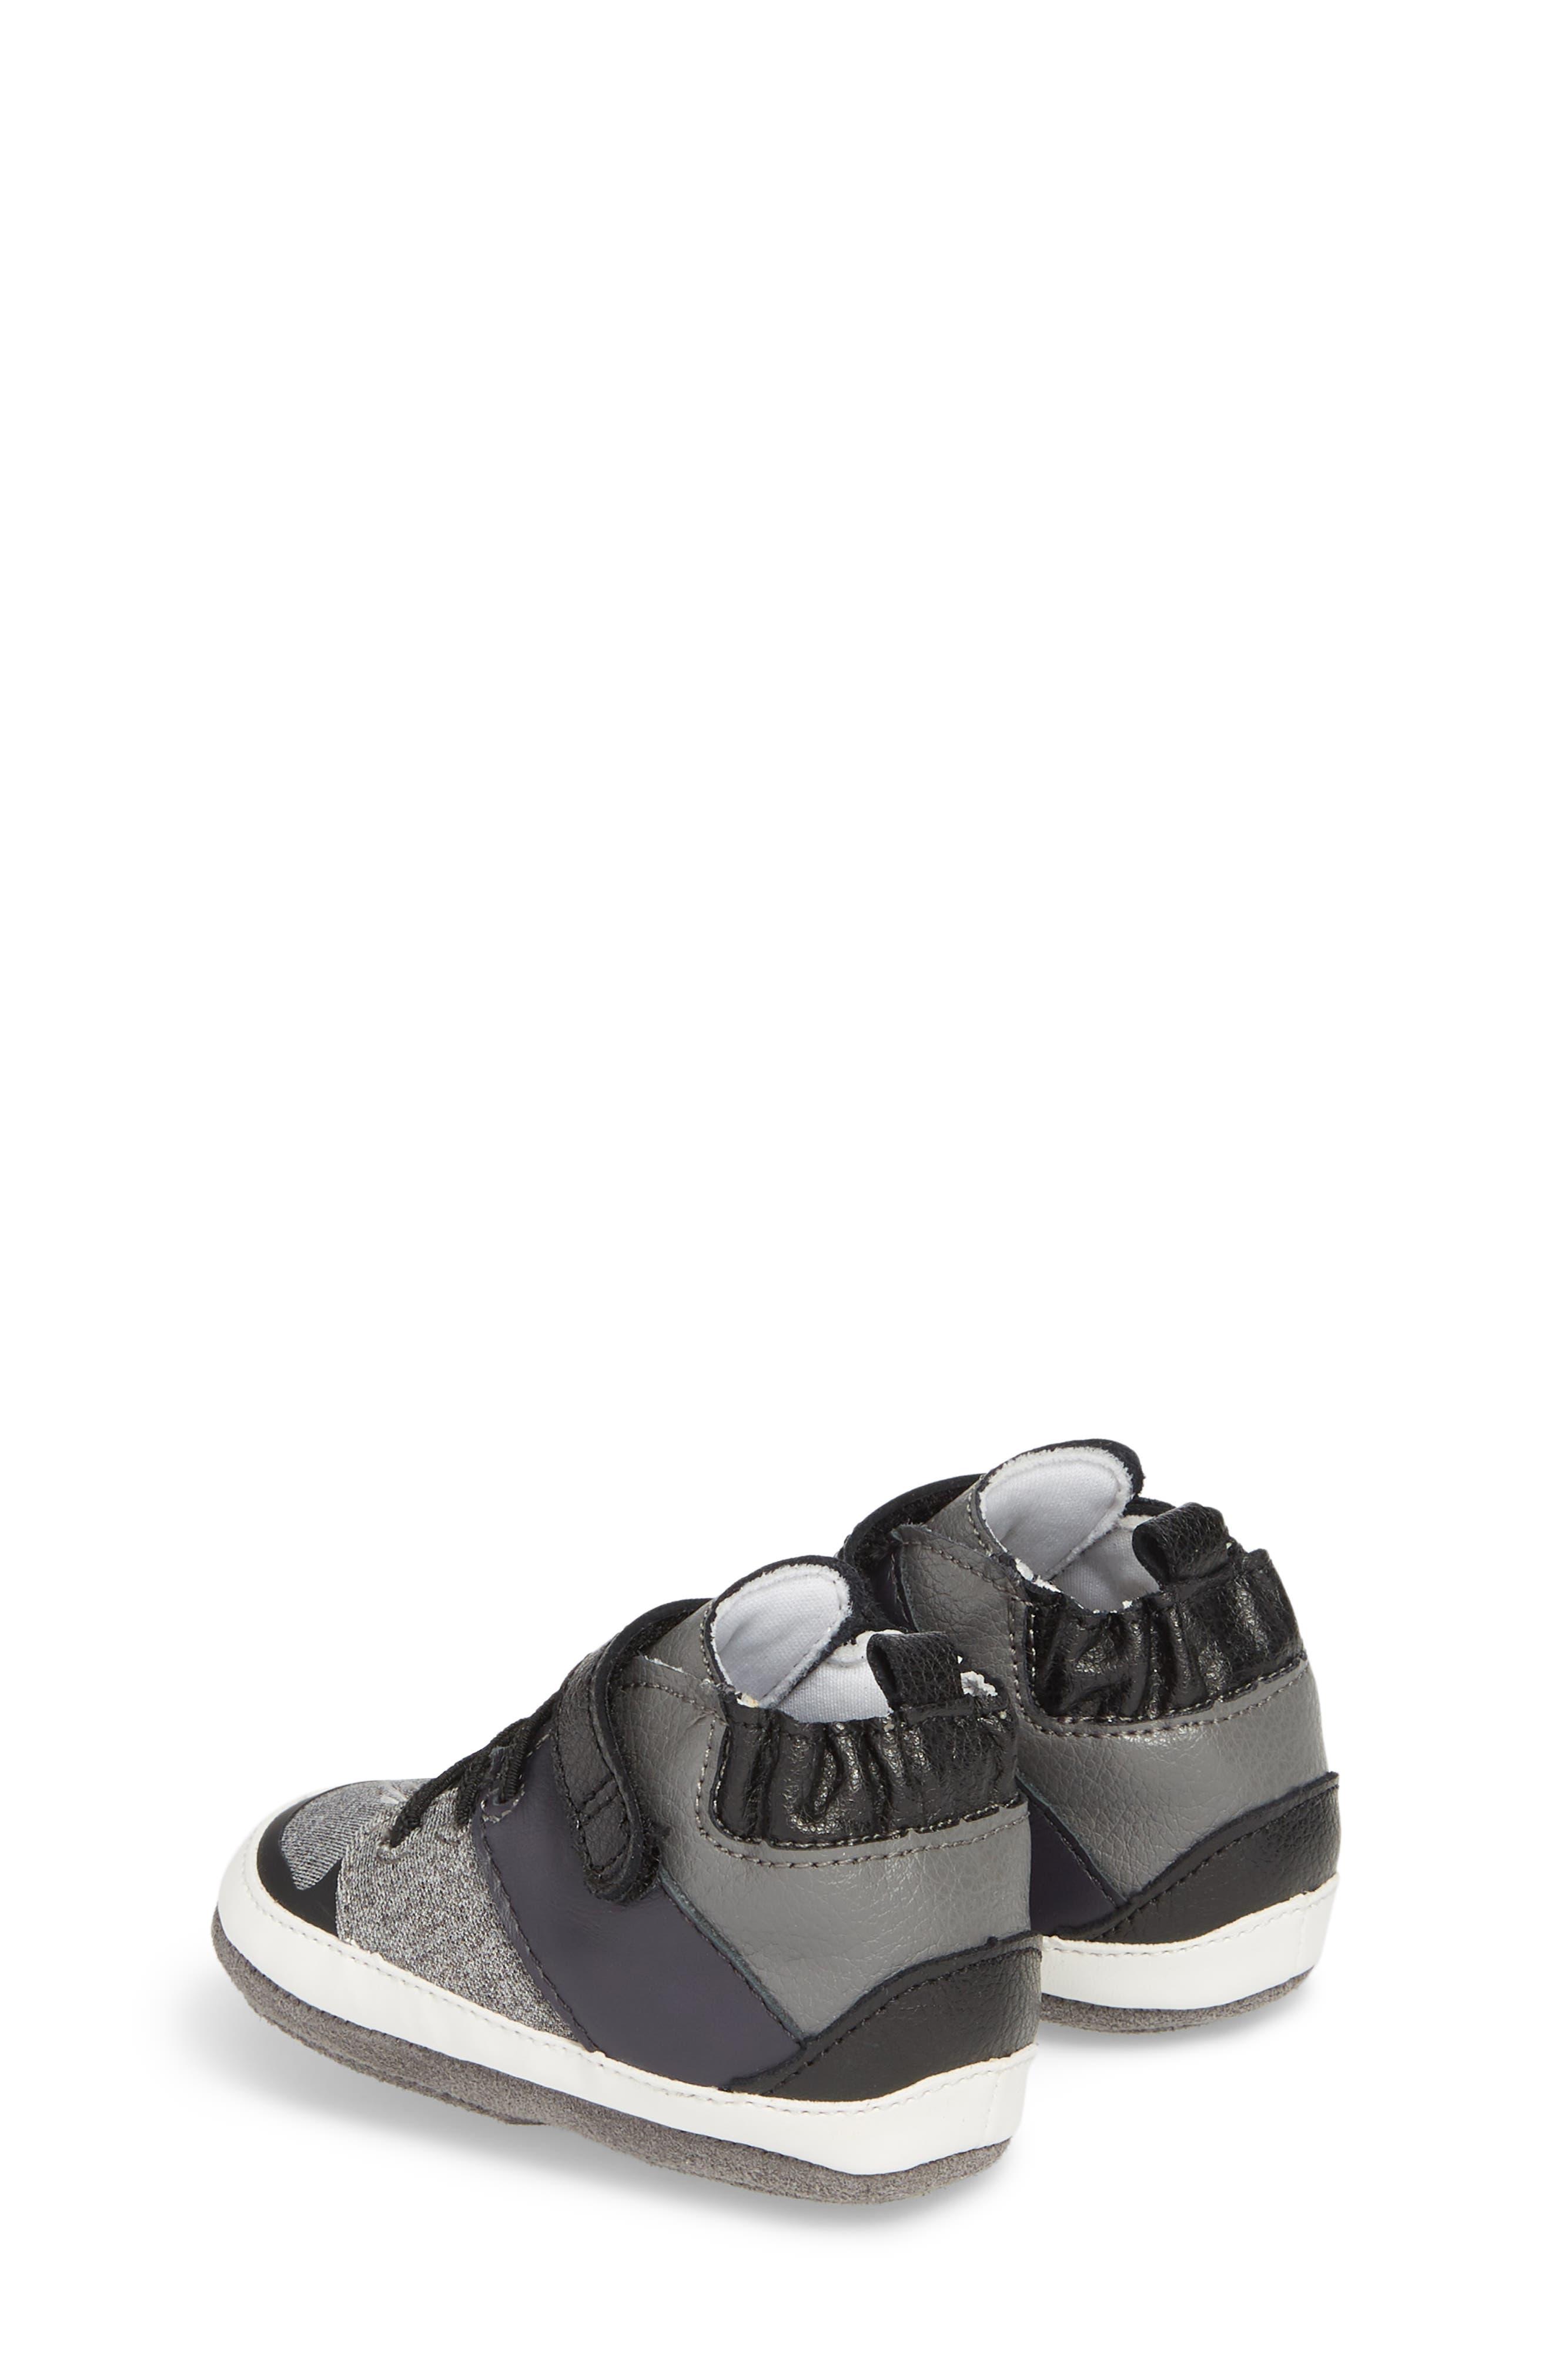 Zachary High Top Crib Sneaker,                             Alternate thumbnail 2, color,                             BLACK